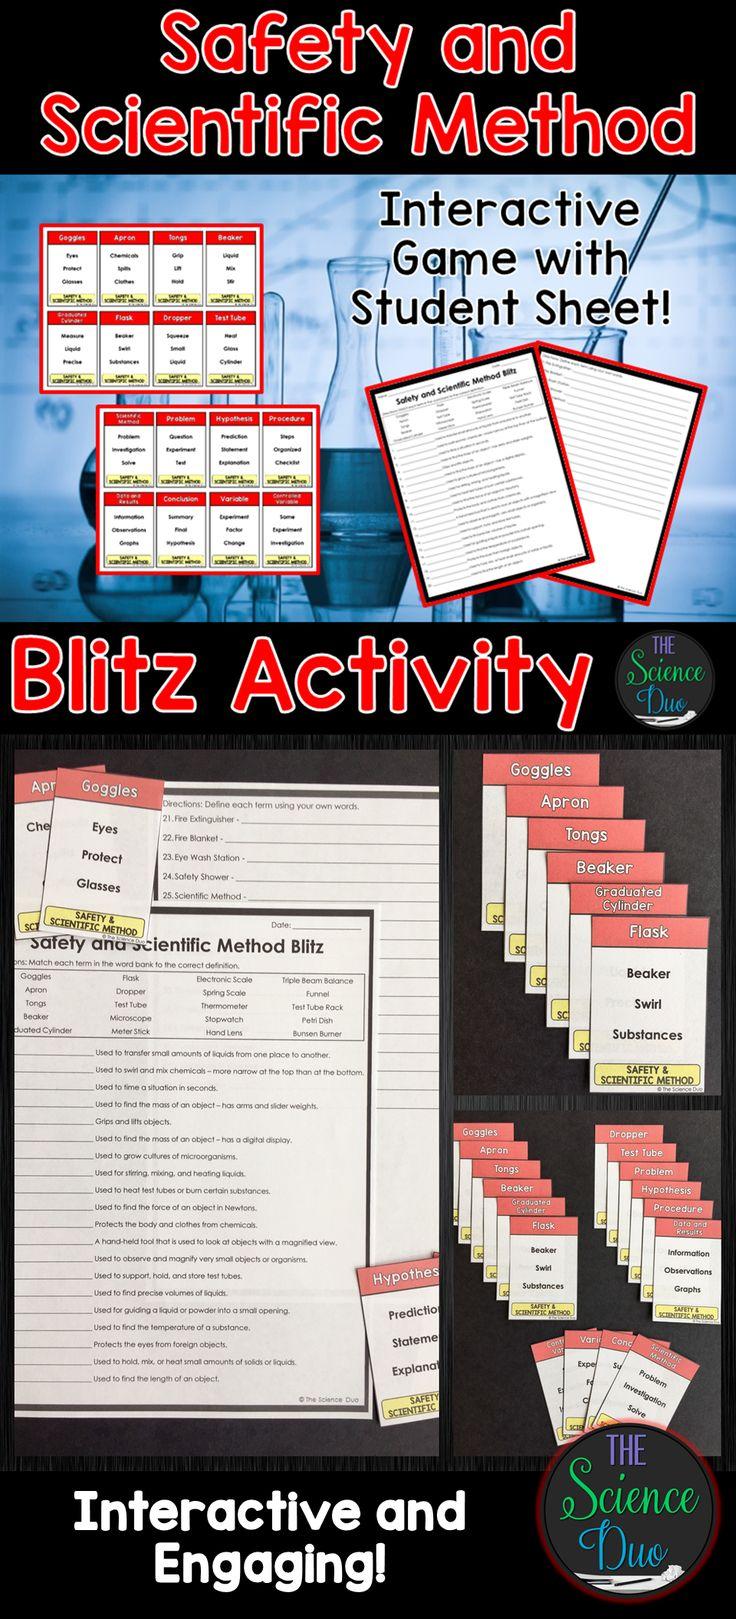 BIO 220 Week 1 Assignment: Scientific Method Matching Exercise